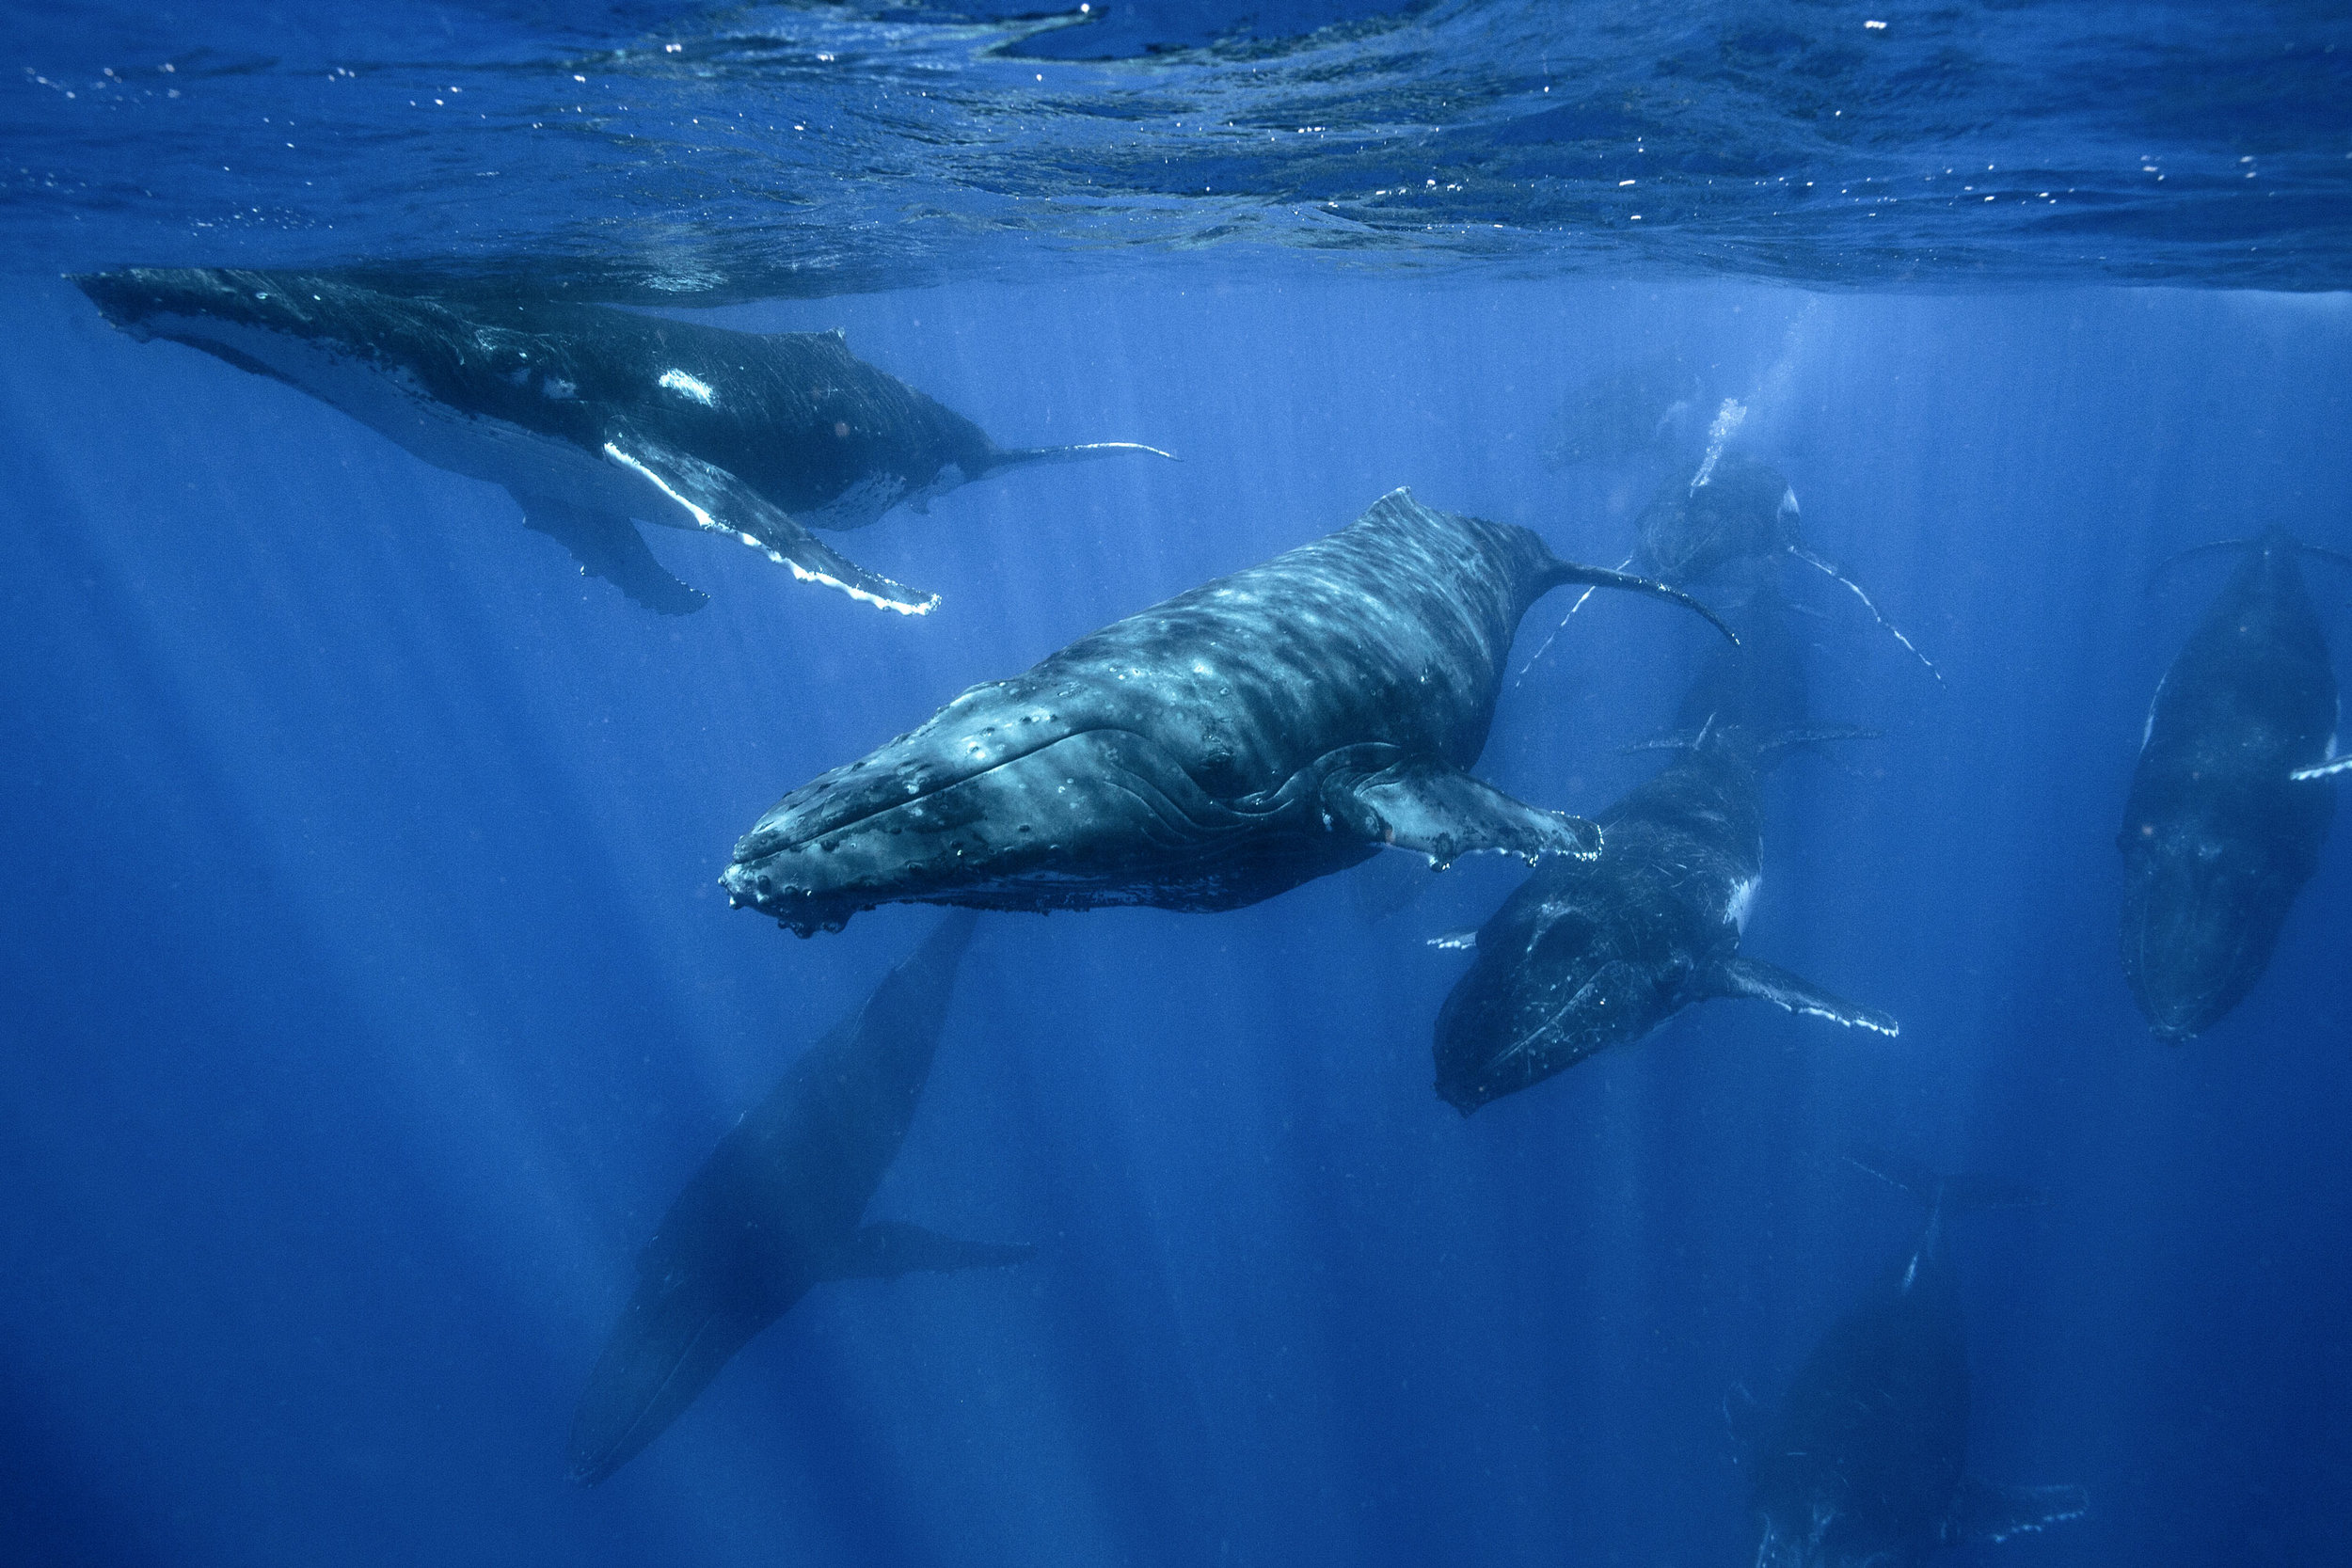 A pod of humpback whales off the coast of Vava'u, Tonga during a heat run.